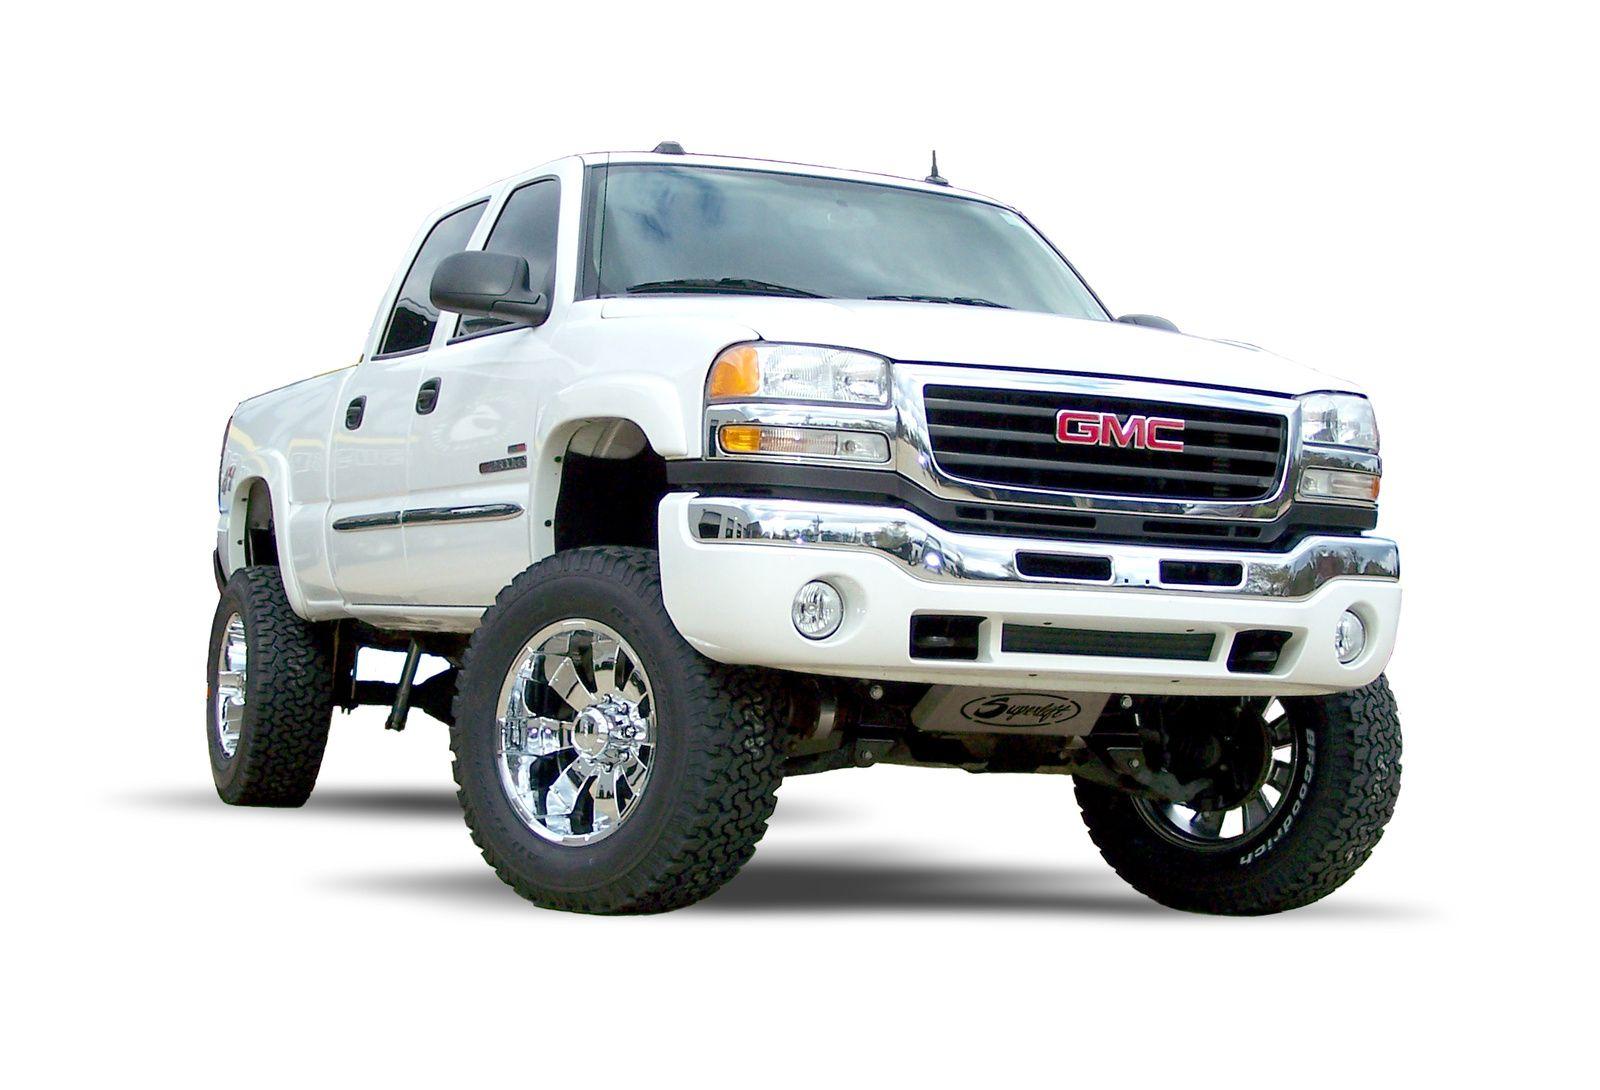 2014 Gmc Truck 2014 Gmc Truck Images Trucks Gmc Truck Gmc